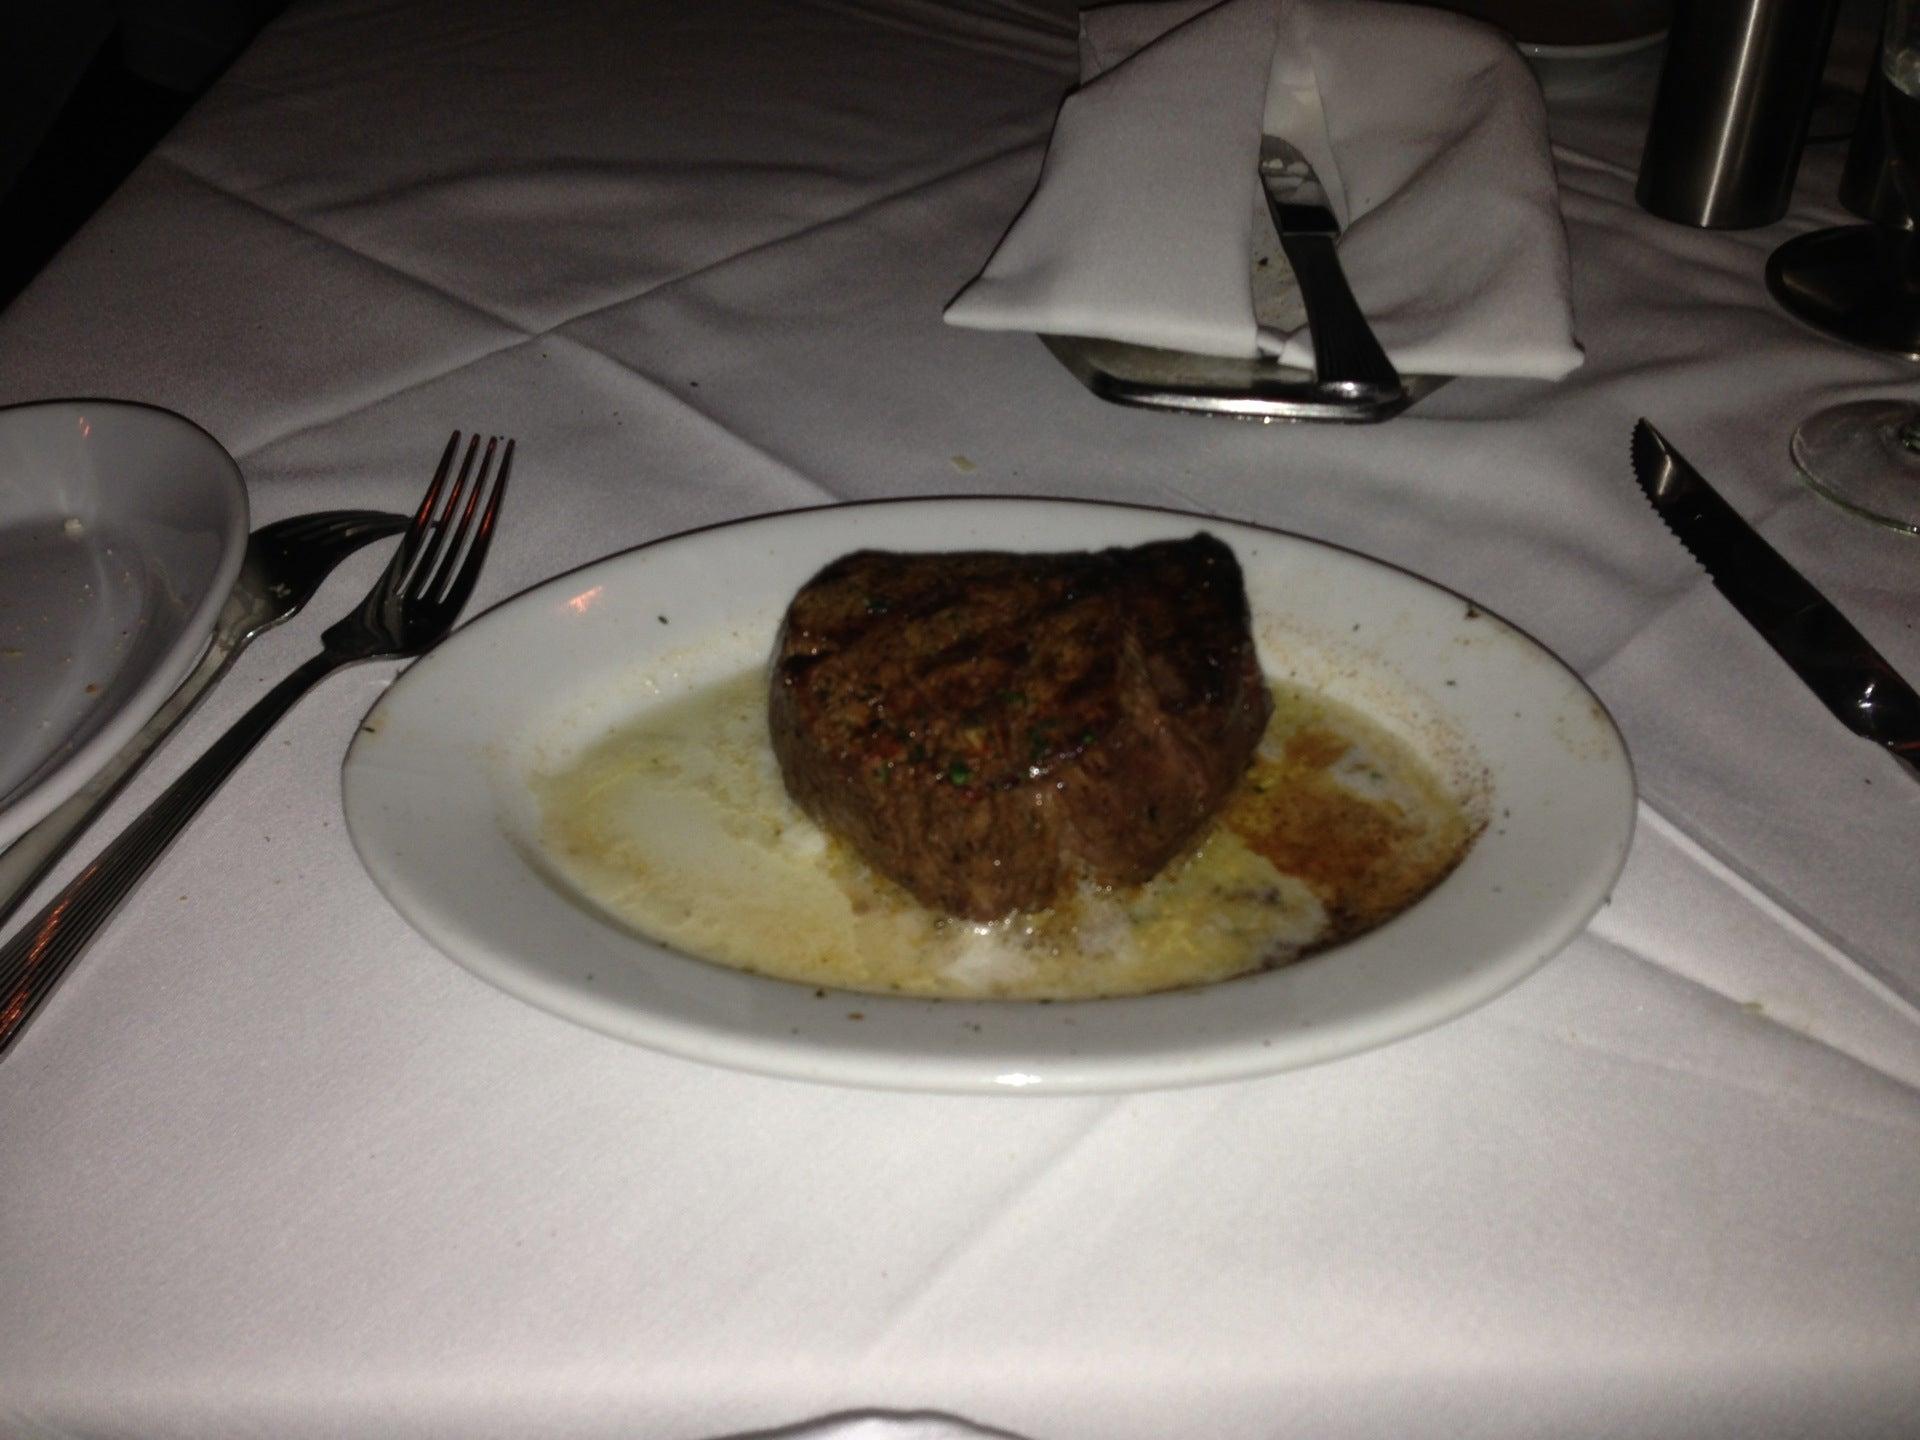 Ruth S Chris Steak House In San Diego Parent Reviews On Winnie